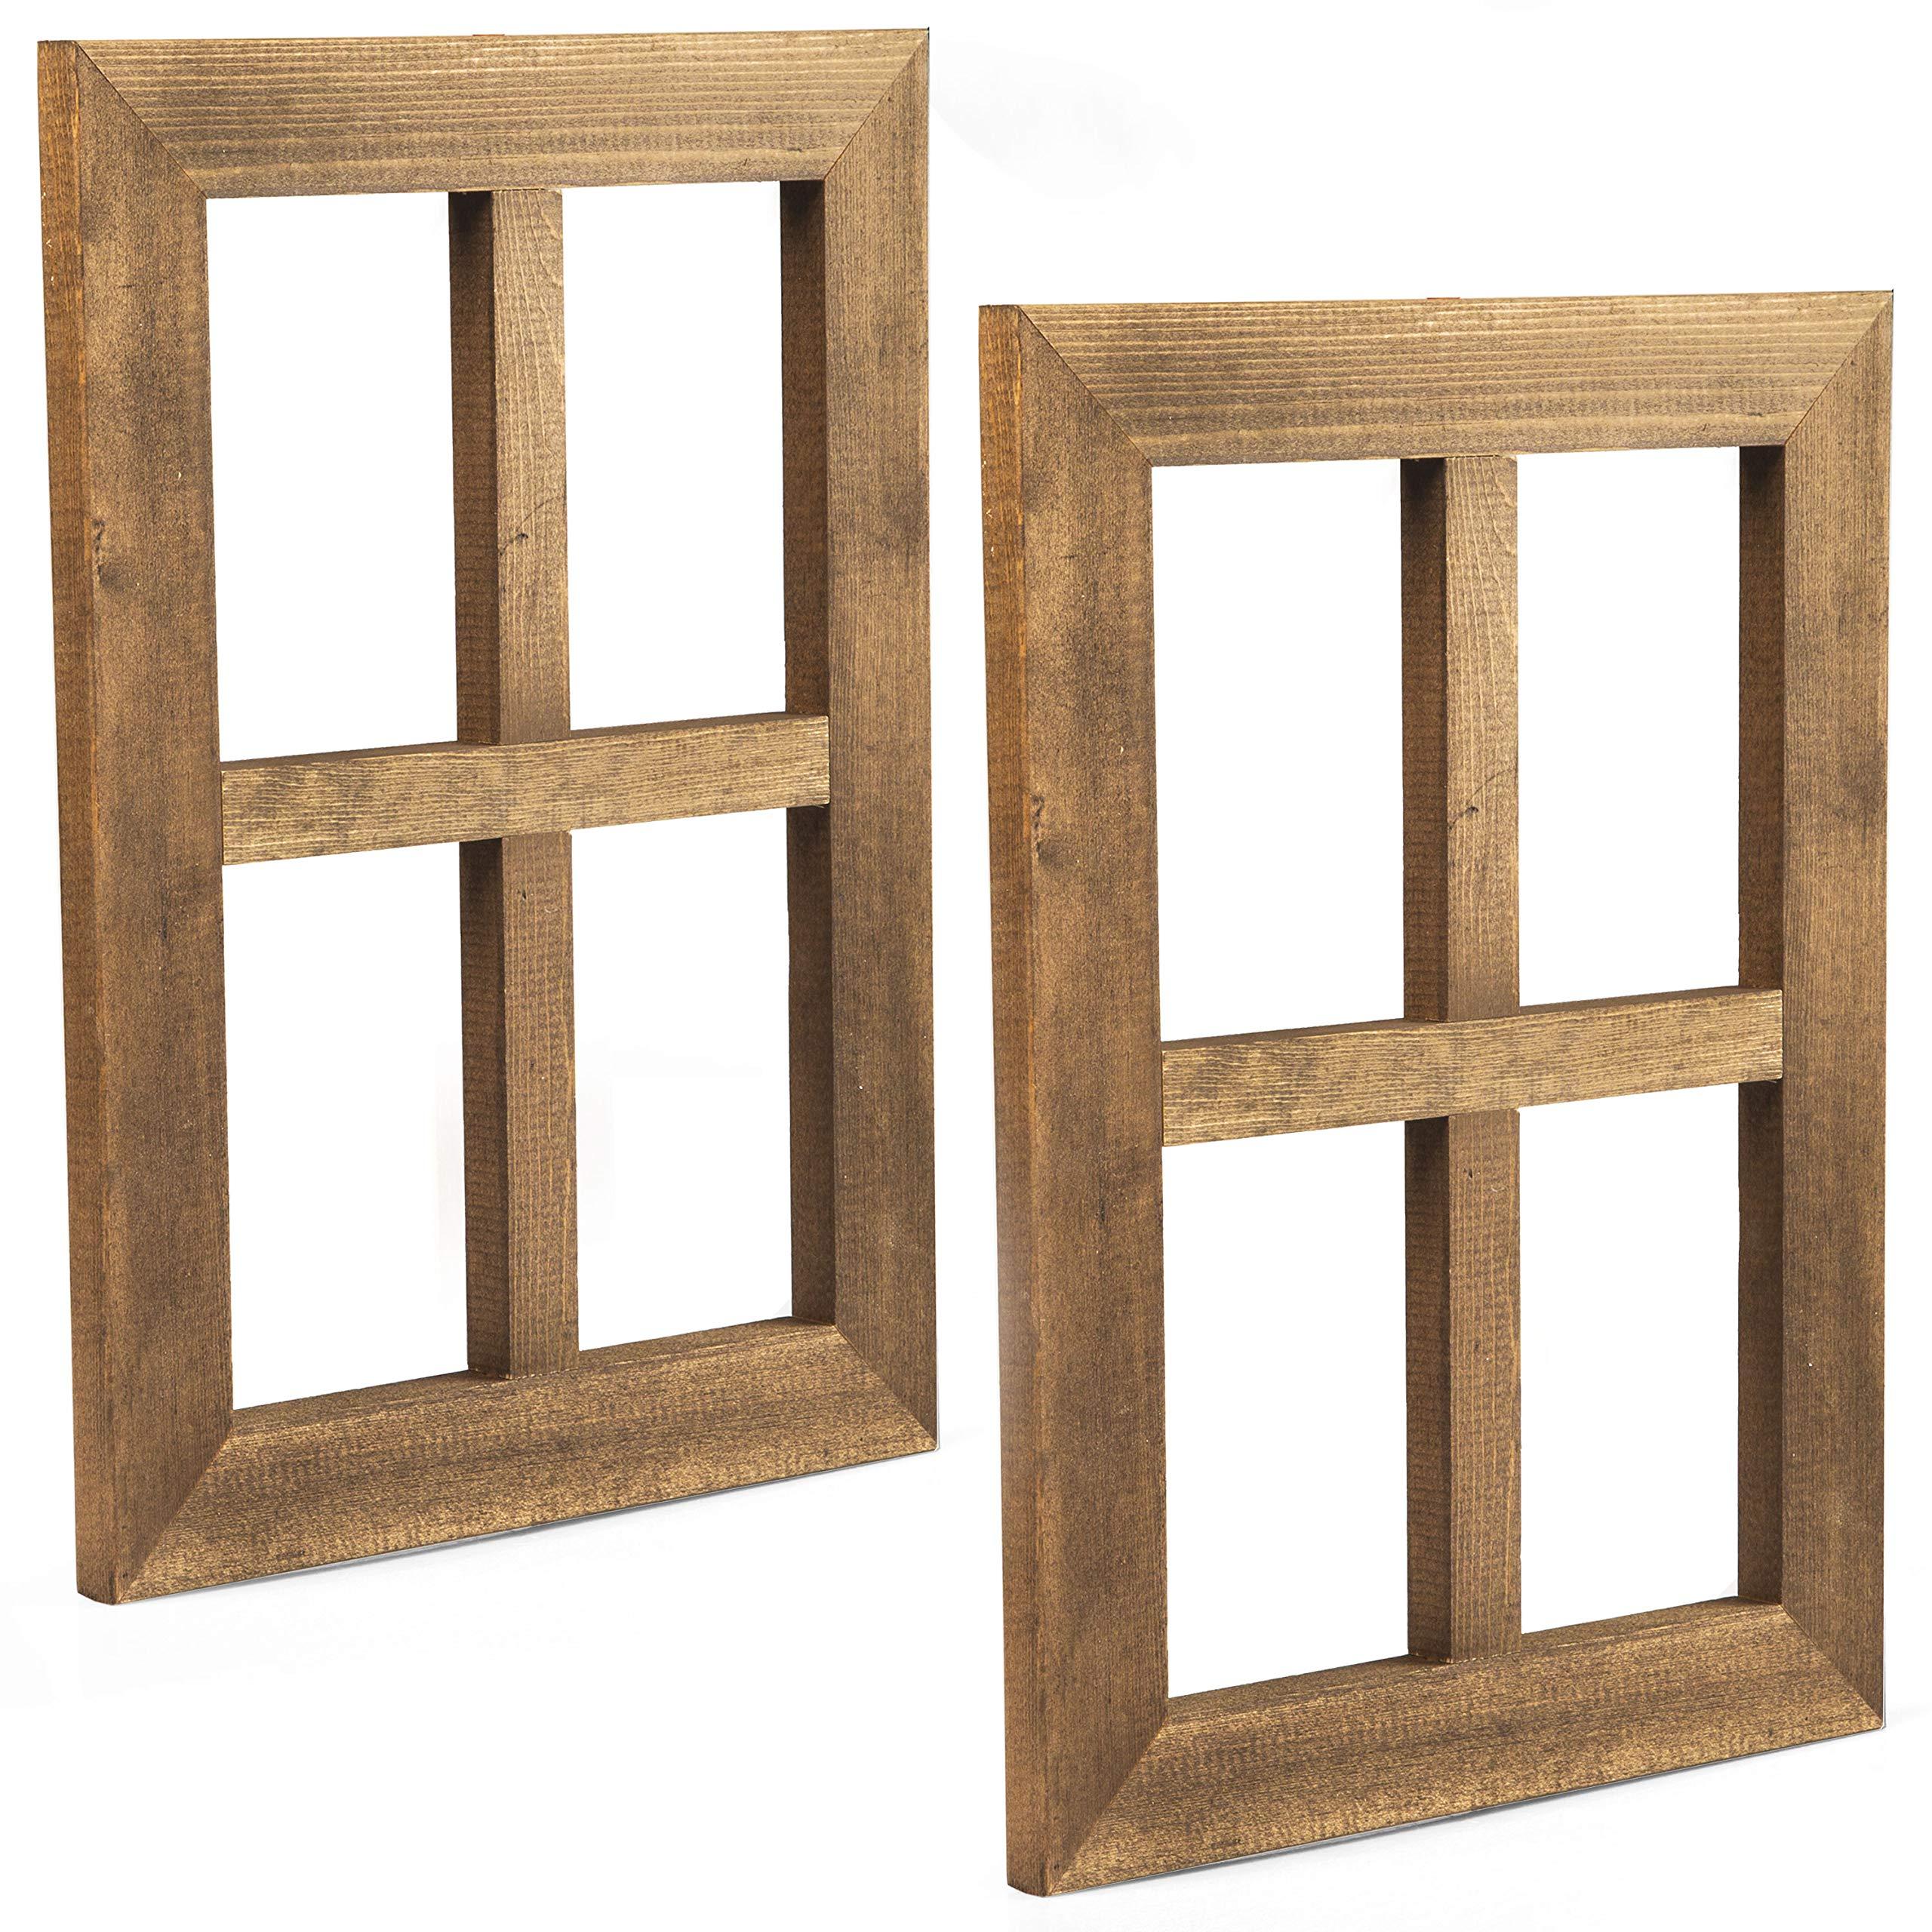 Ilyapa Window Frame Wall Decor 2 Pack - Rustic Wood Window Pane Country Farmhouse Decorations by Ilyapa